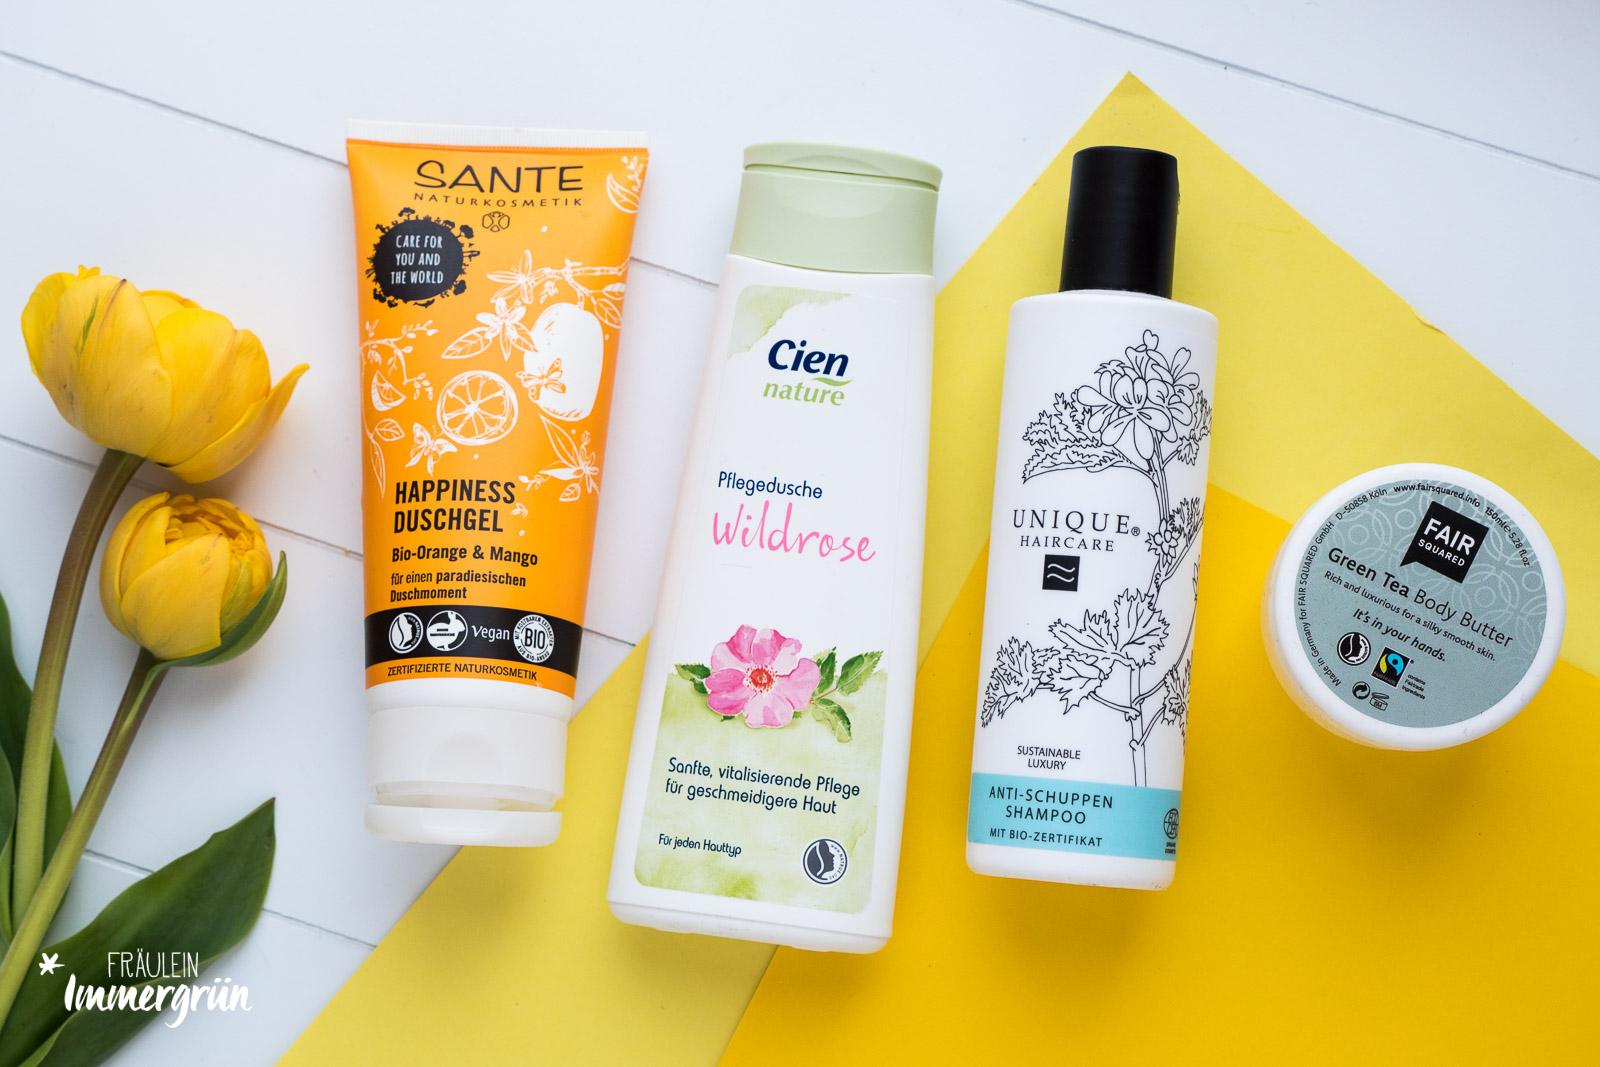 Sante Happiness Duschgel,  Cien Nature Pflegedusche Wildrose,  Unique Haircare Anti-Schuppen-Shampoo,  Fair Squared Green Tea Body Butter